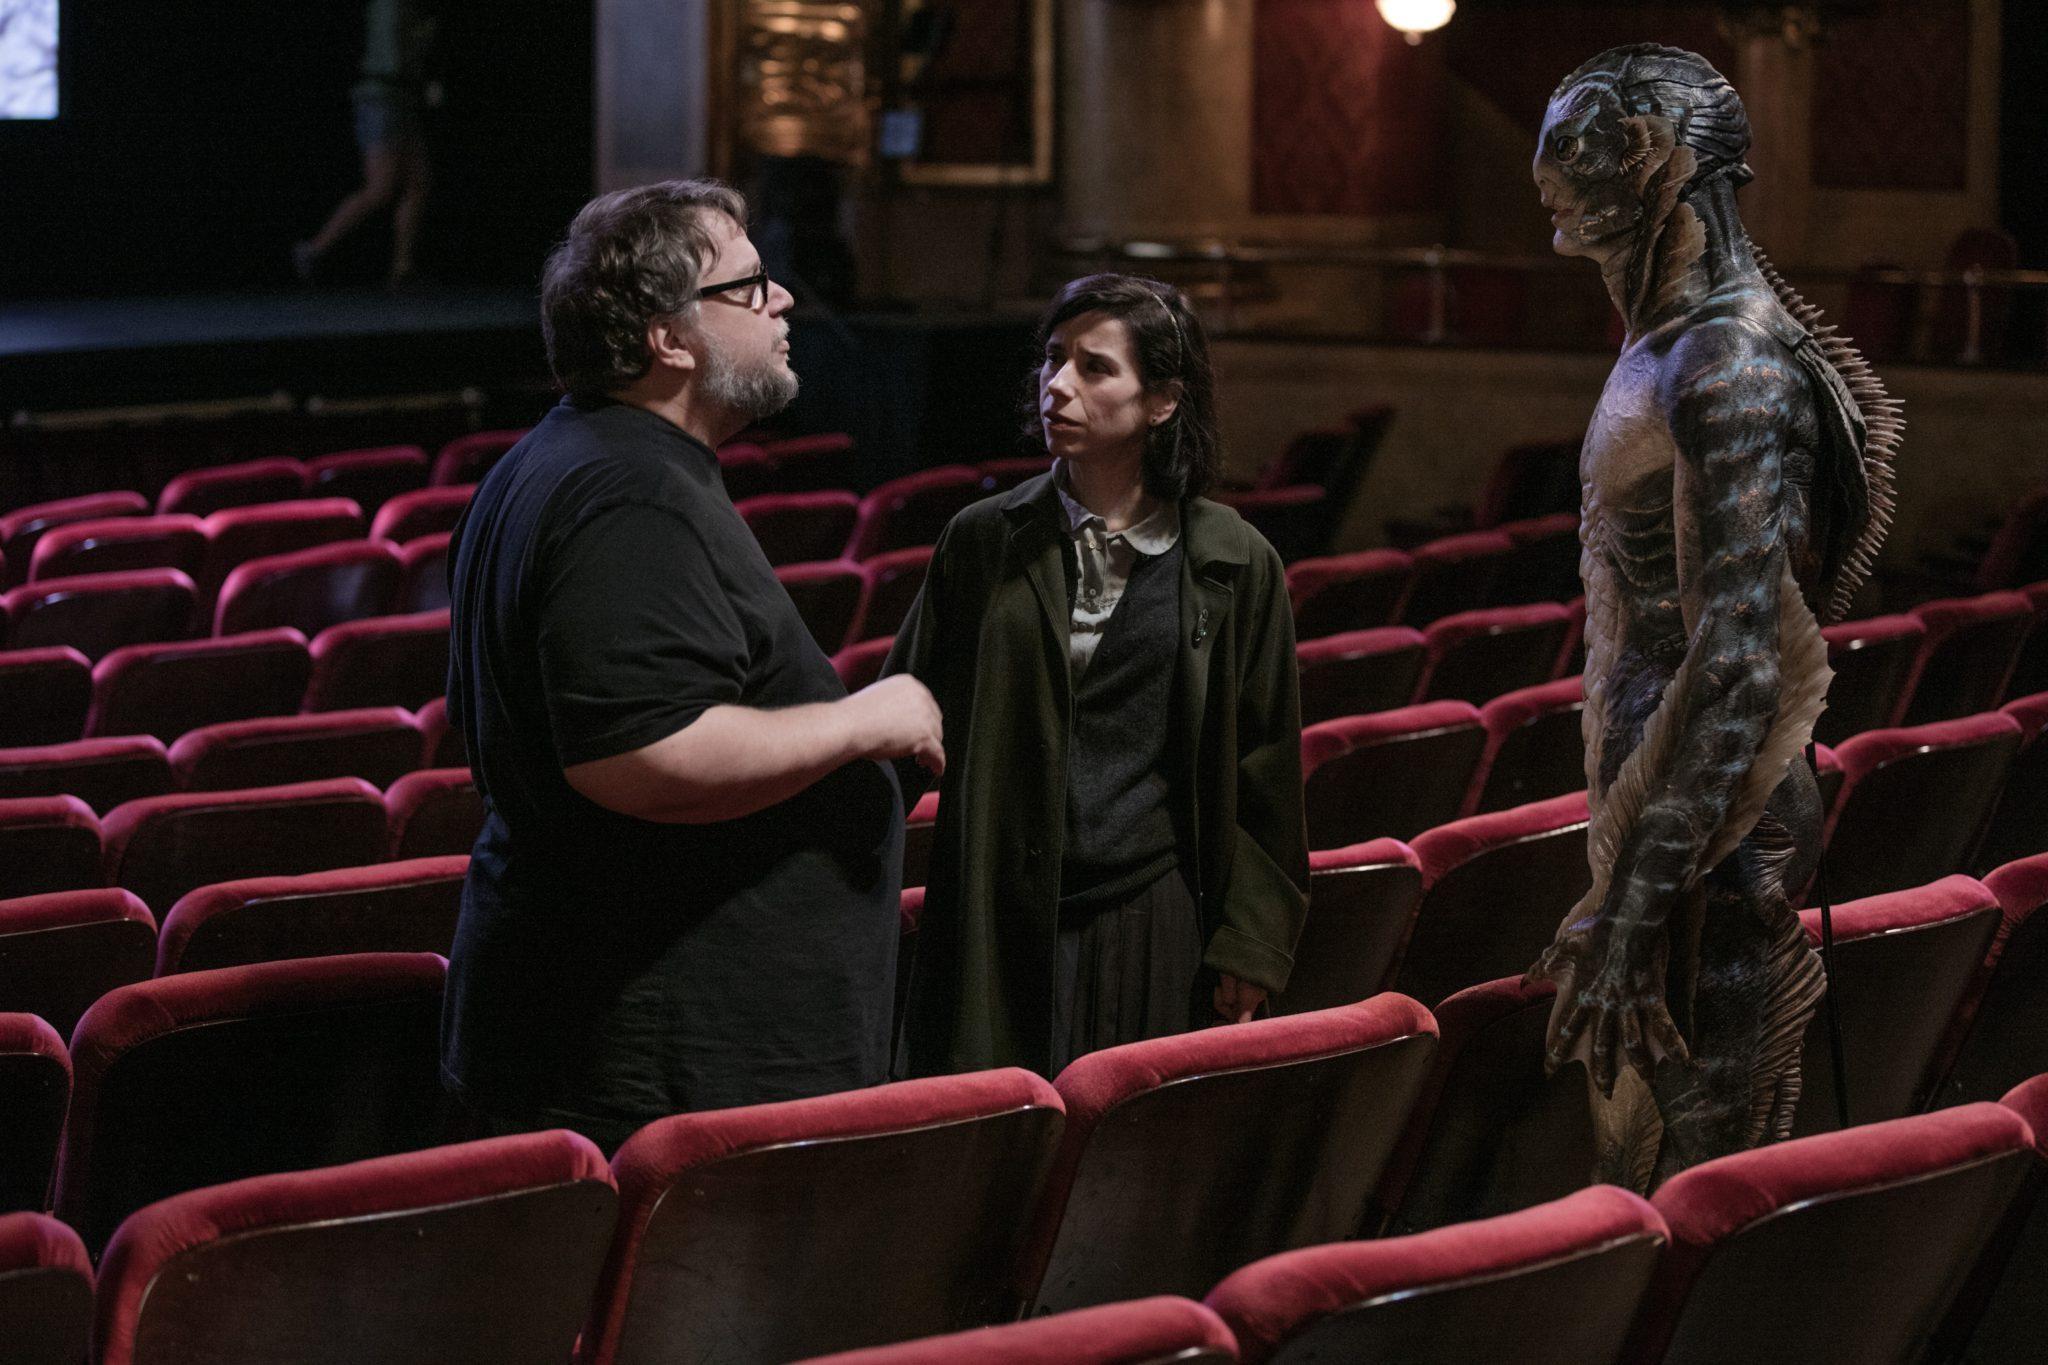 La Forme de l'eau Guillermo del Toro image tournage